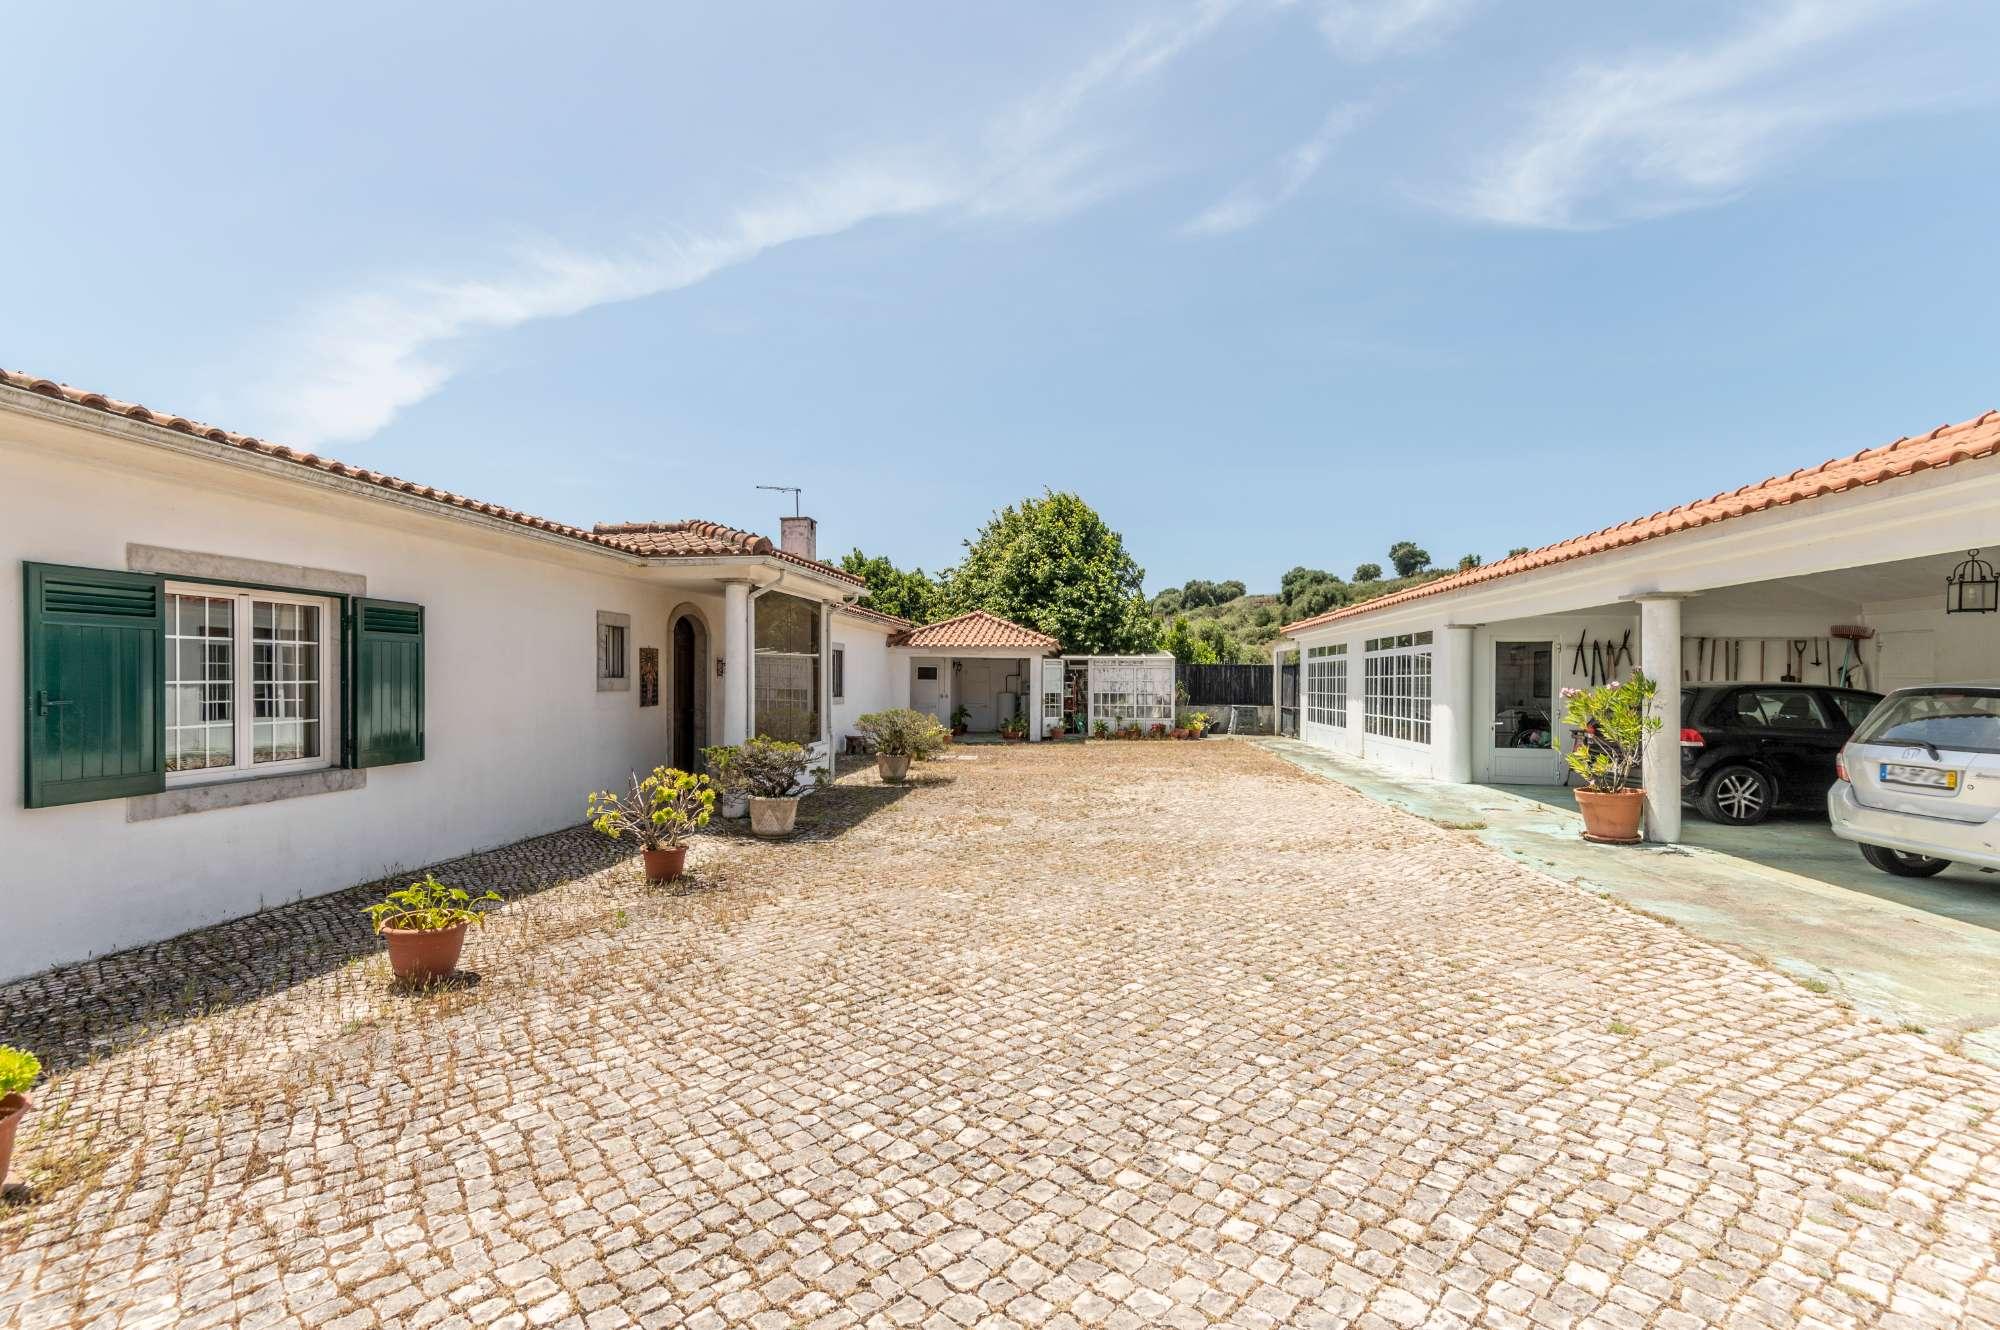 4 Bedroom House, Sintra